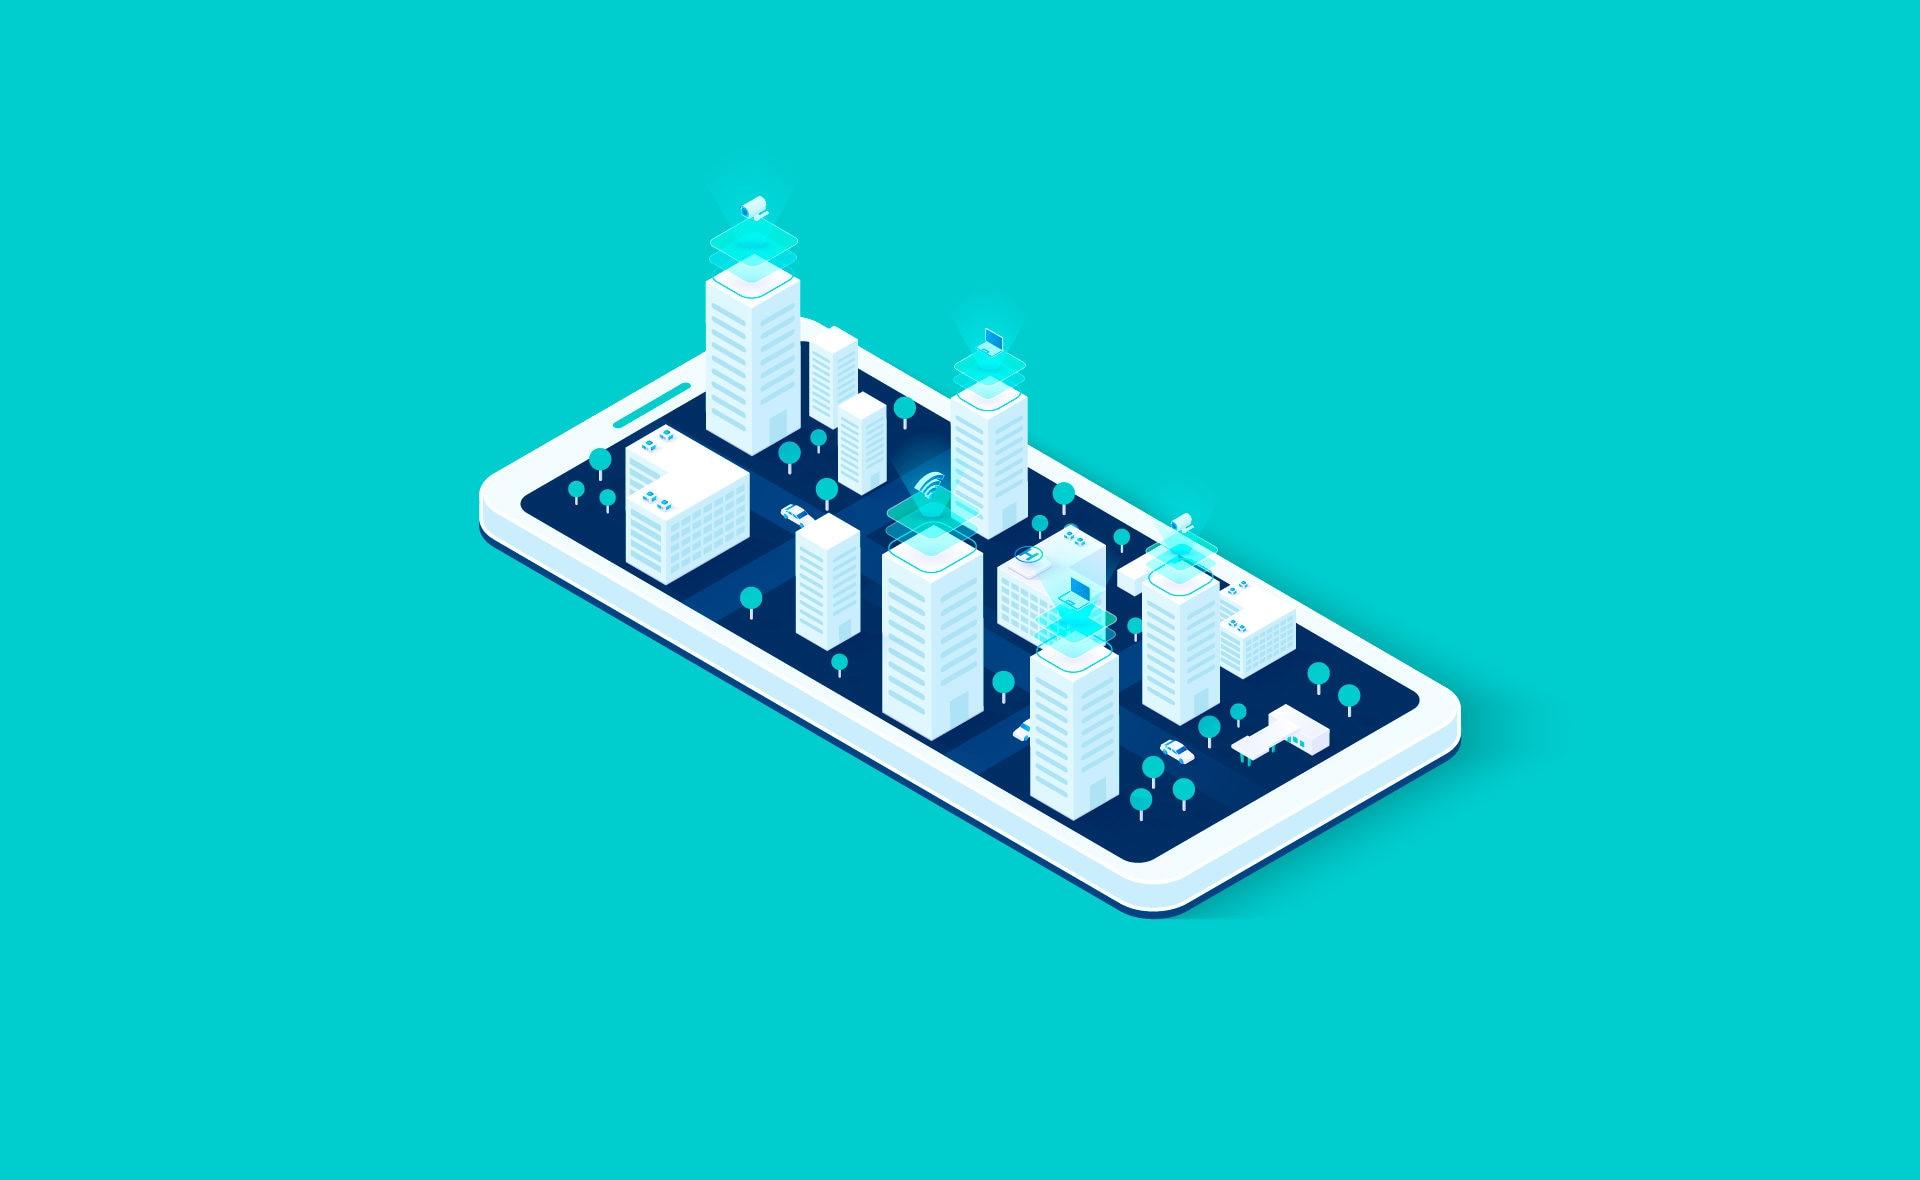 smart-city-ciudades-inteligentes-tecnologia-innovación